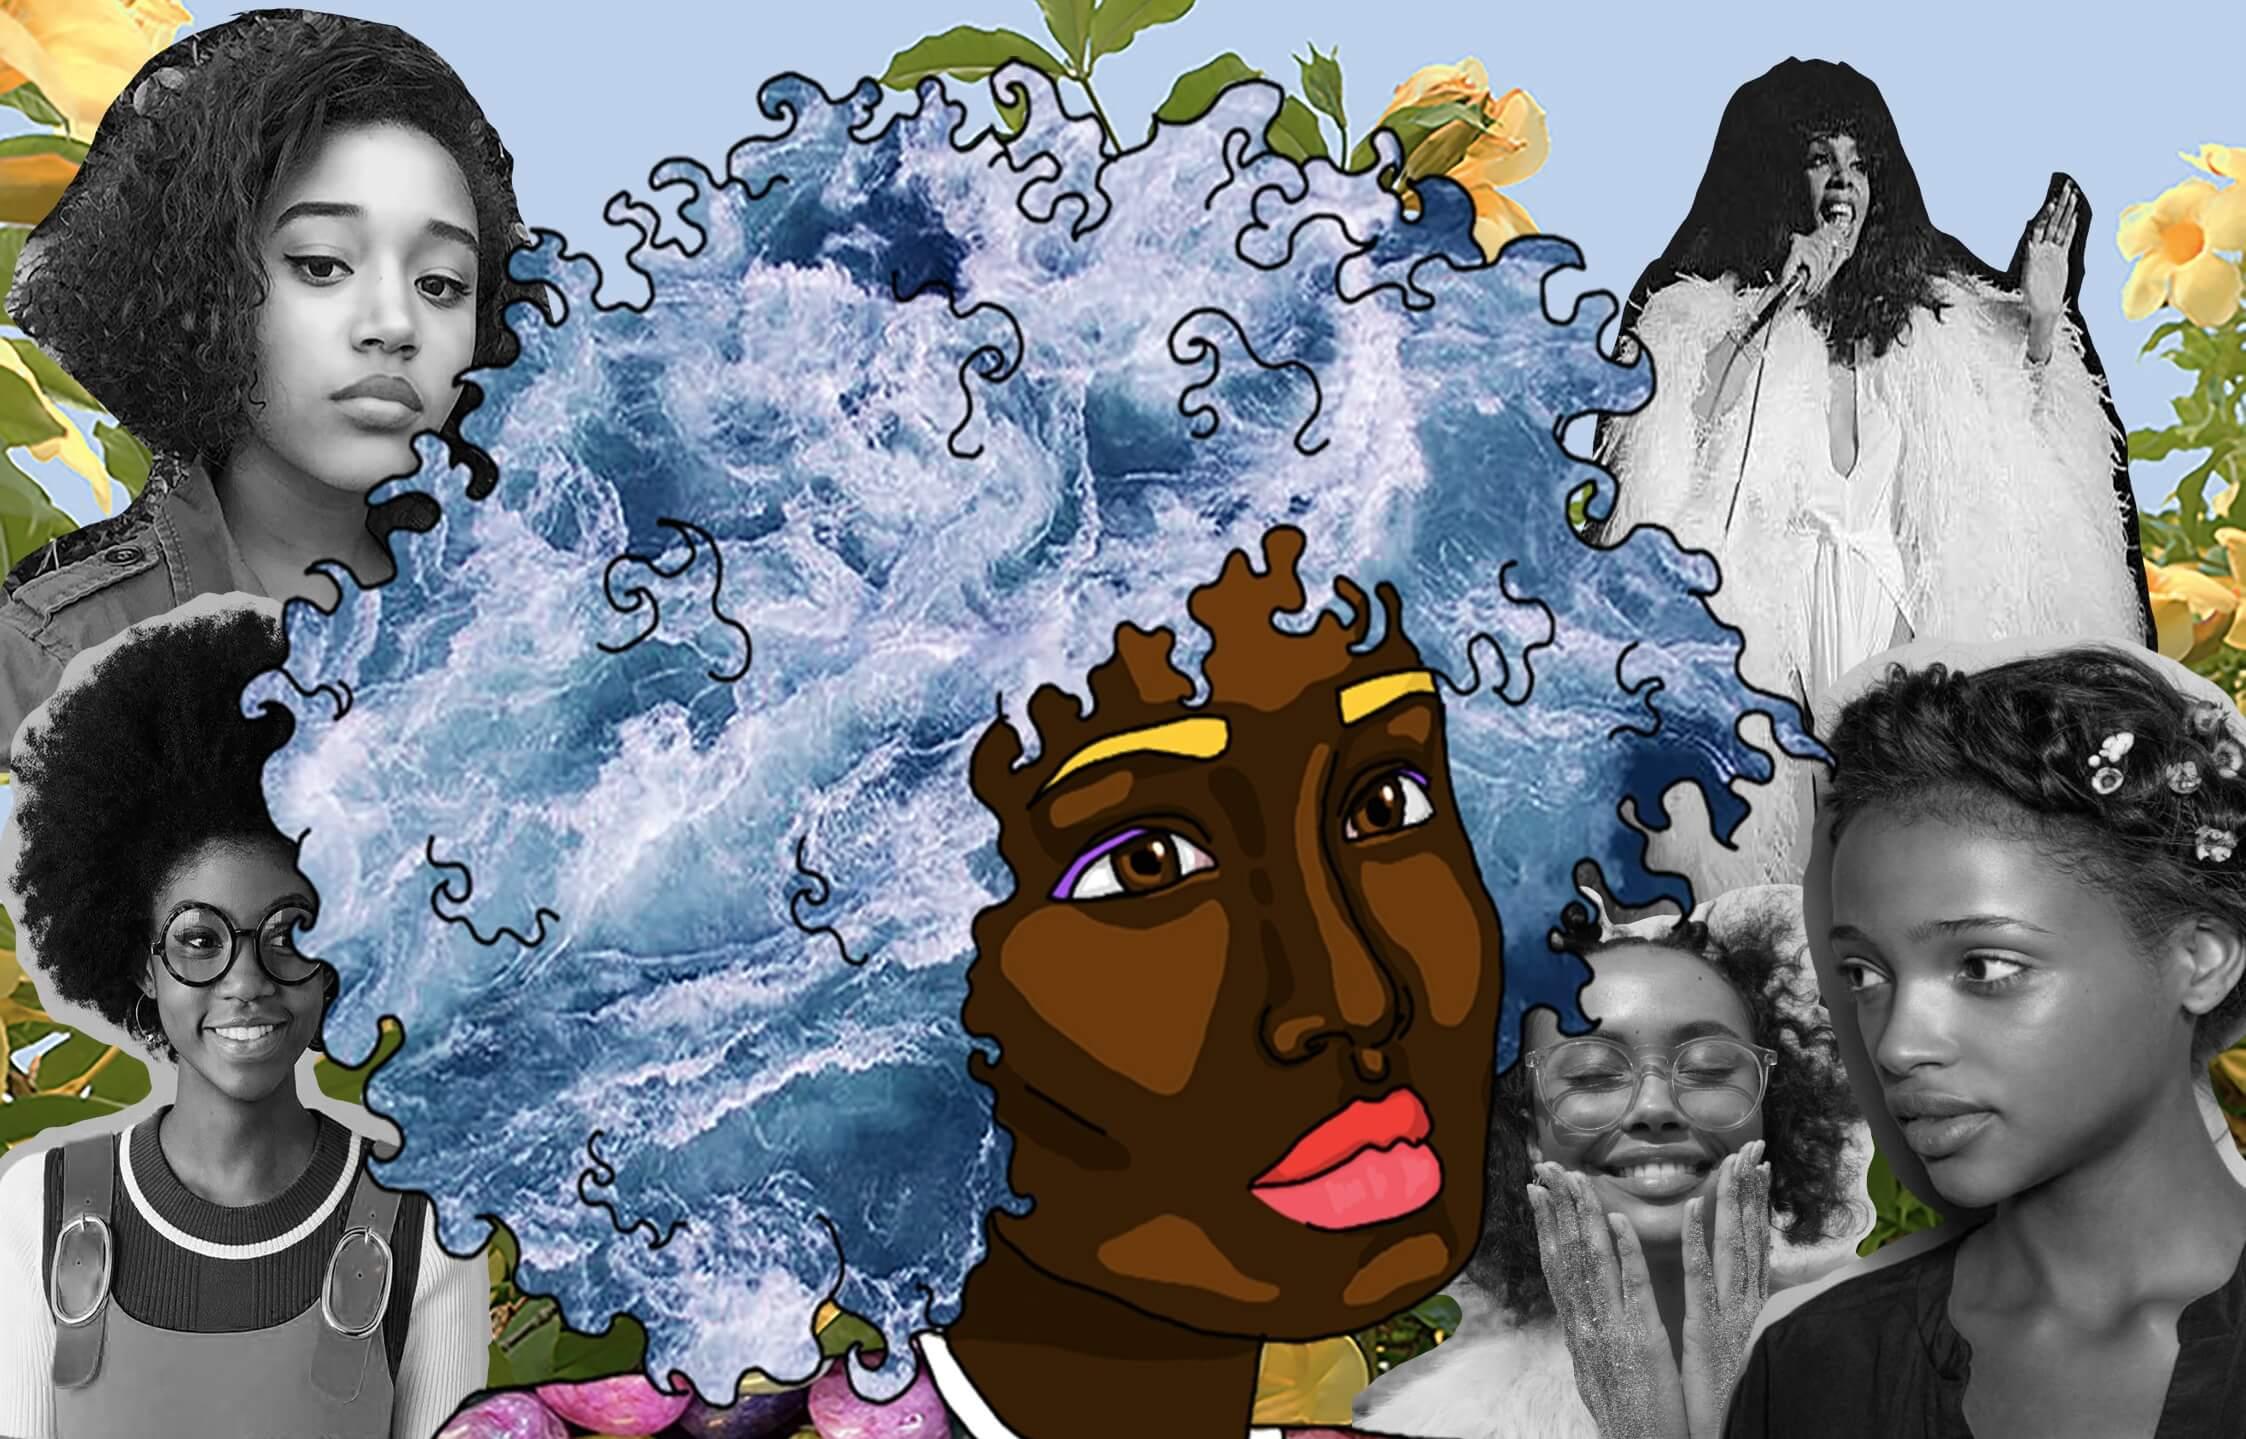 Collage by Lola Nova.